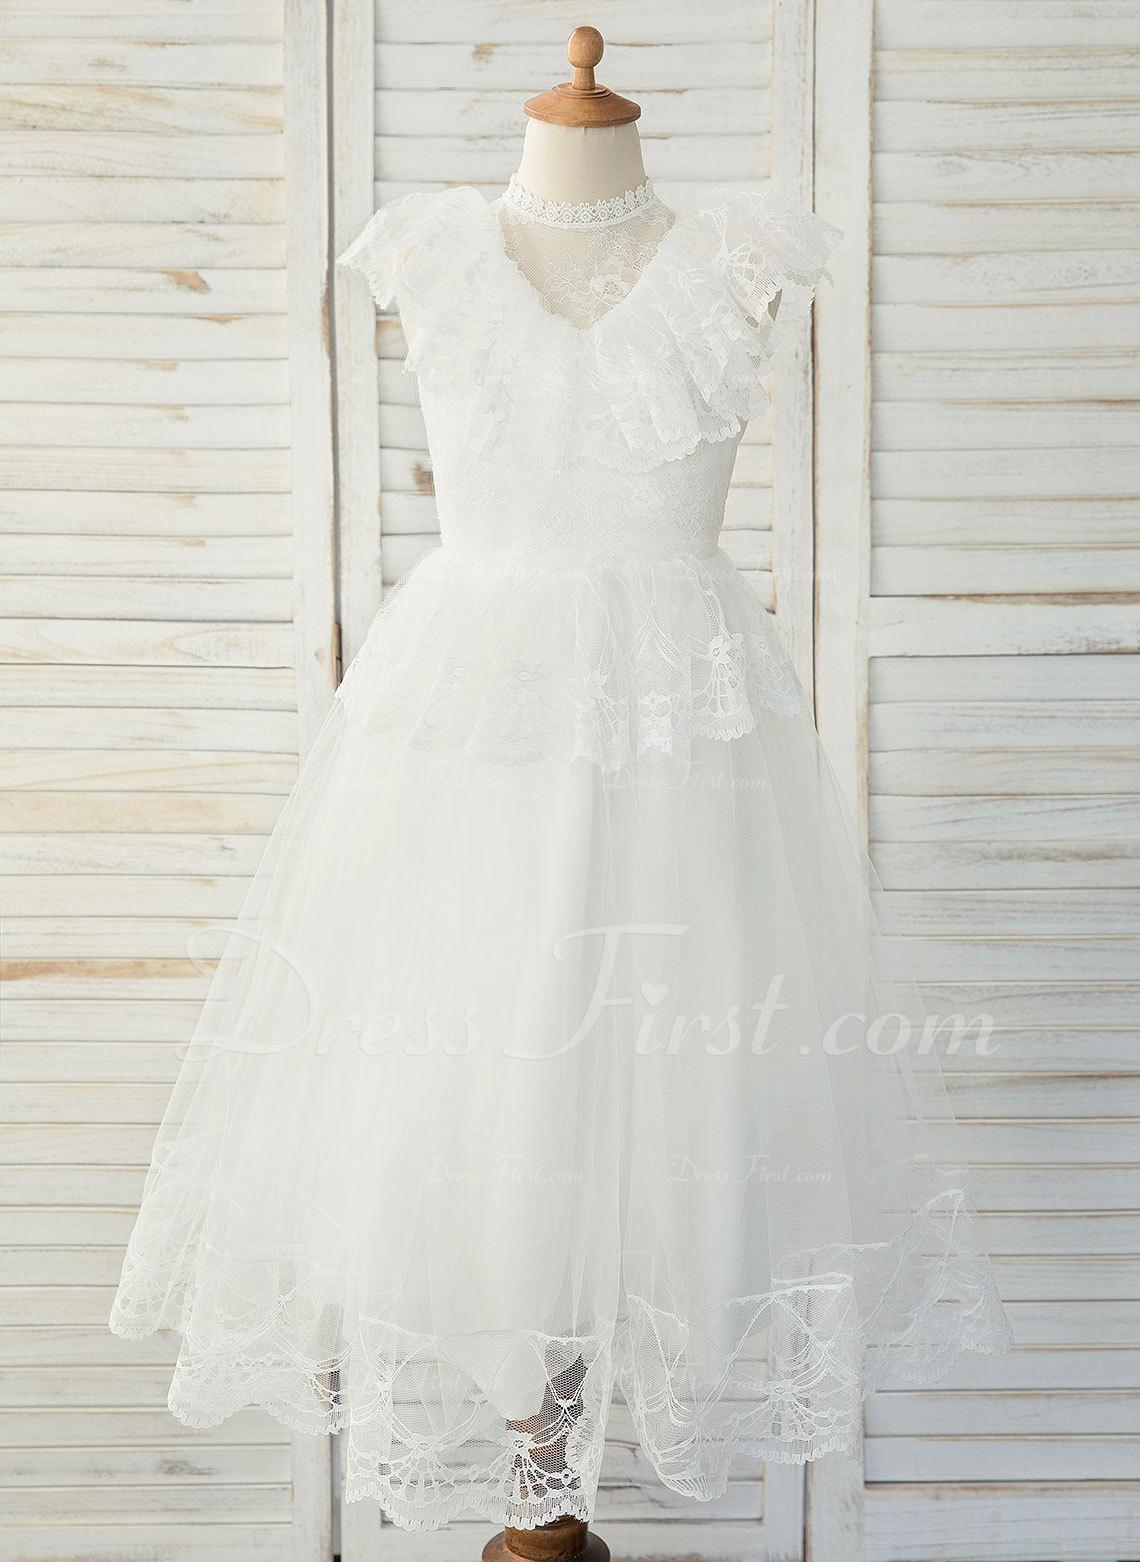 7633de3280d33 A-Line Tea-length Flower Girl Dress - Tulle/Lace Sleeveless Scoop Neck With  Ruffles #183526